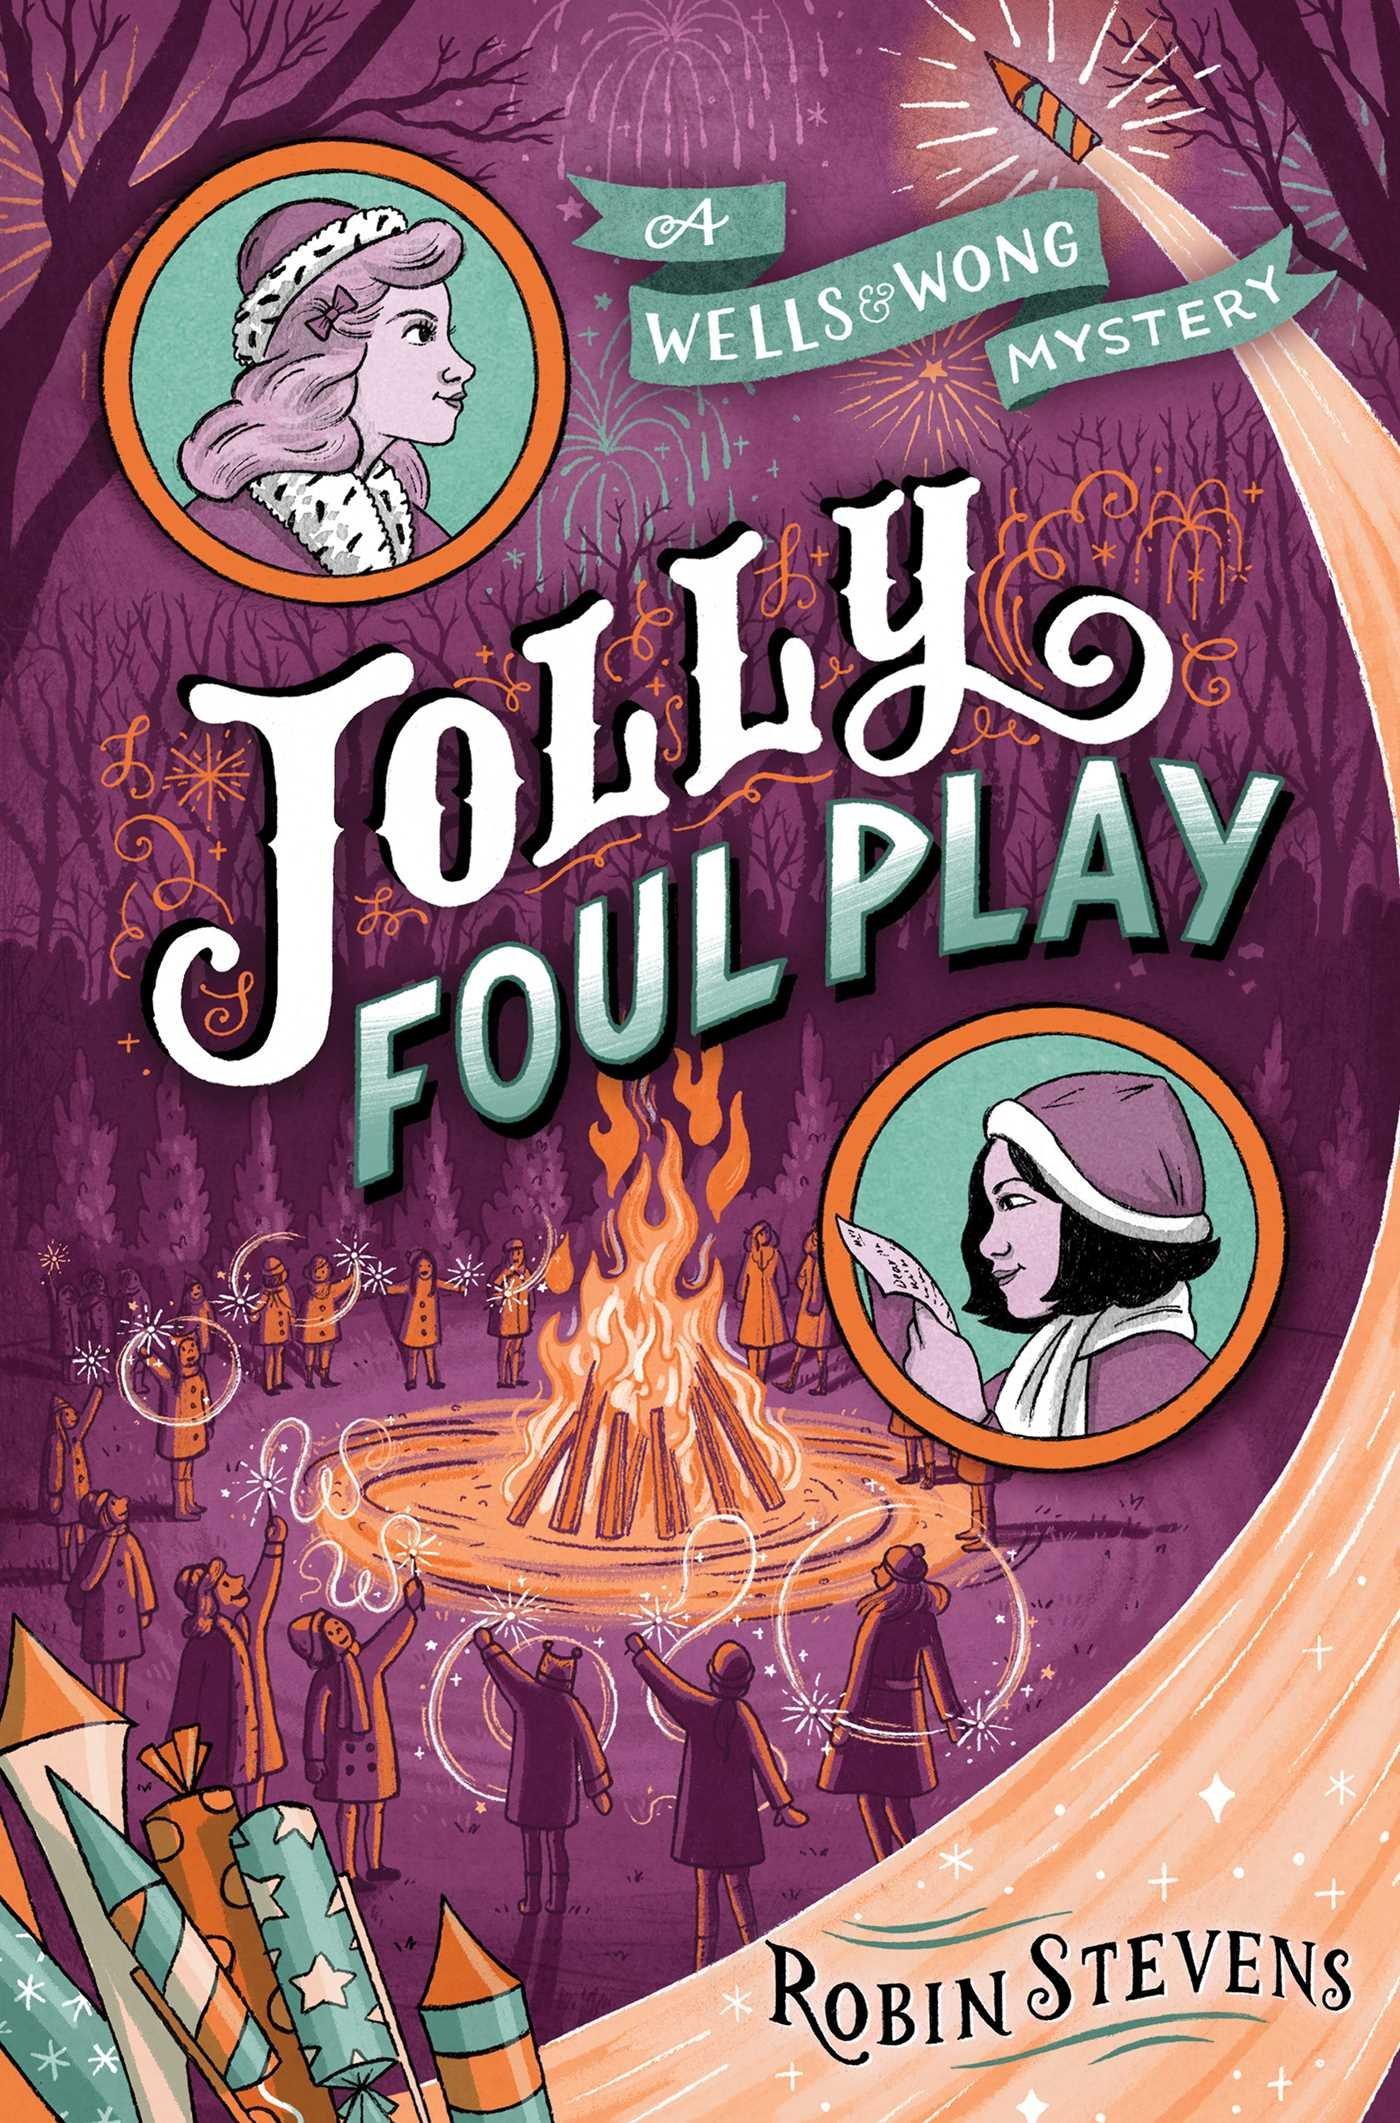 Read Online Jolly Foul Play (WELLS & WONG JOLLY FOUL) PDF